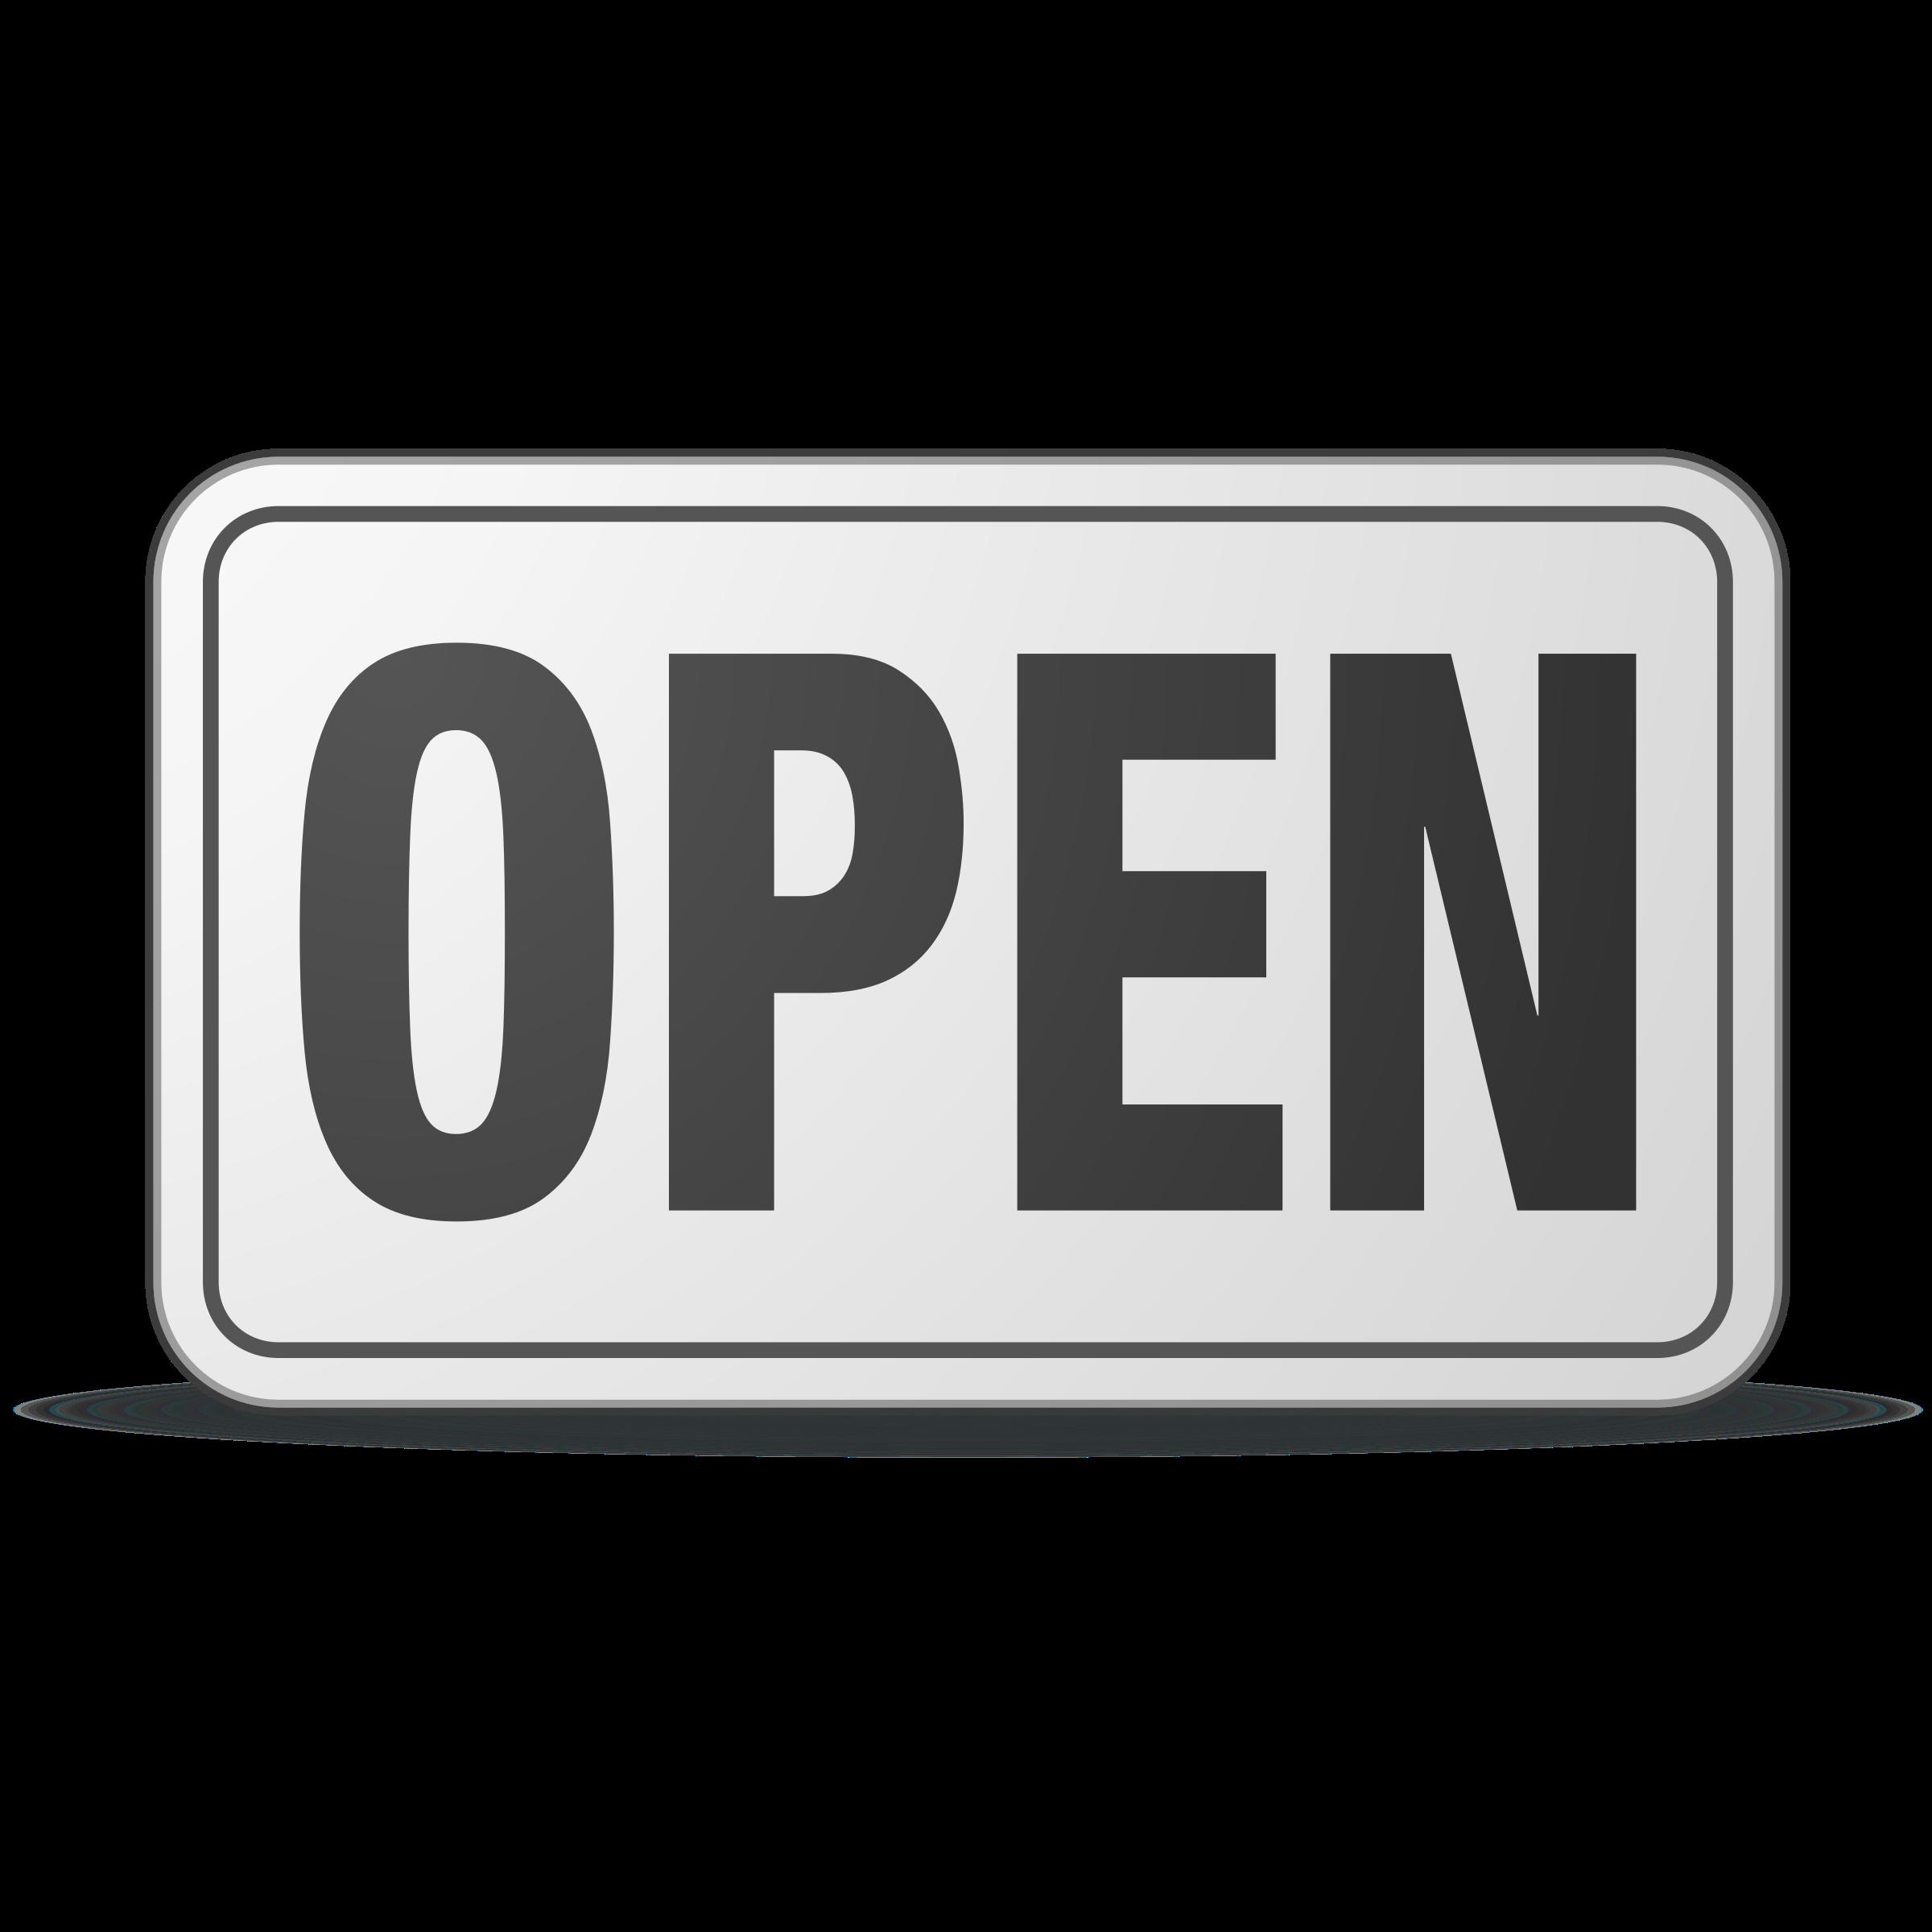 Open clipart. Sign plastic big image